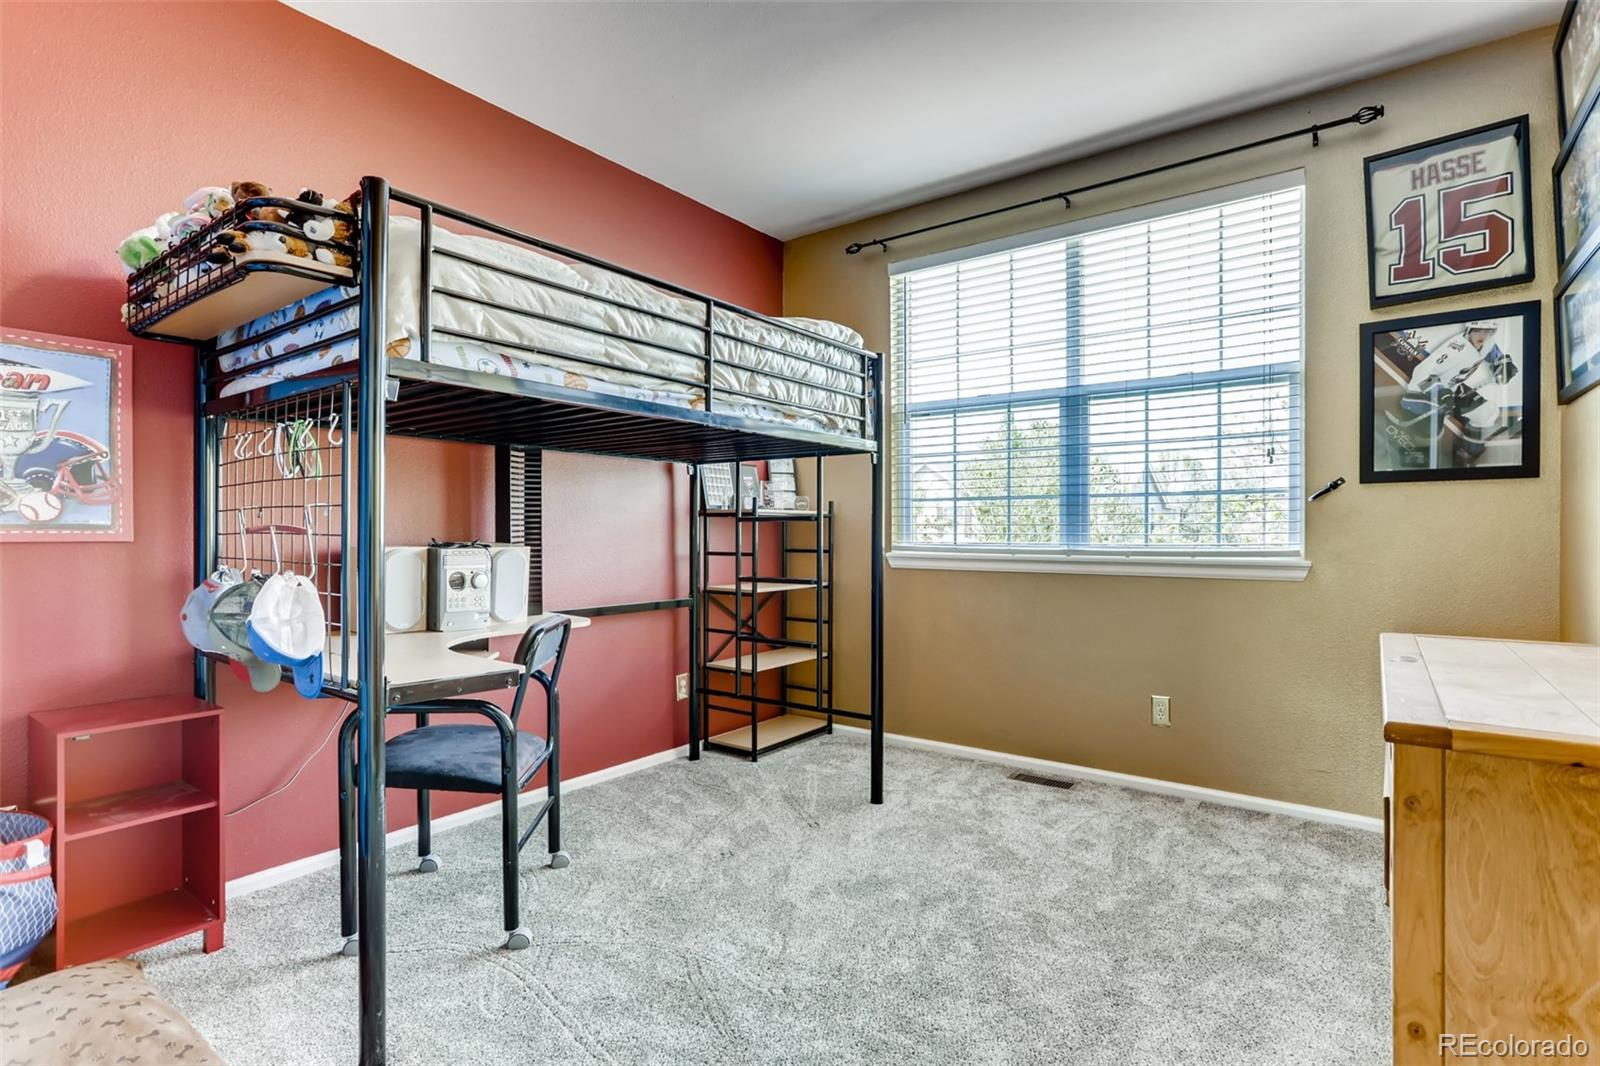 MLS# 5875939 - 23 - 7334 E Cedar Avenue, Denver, CO 80230